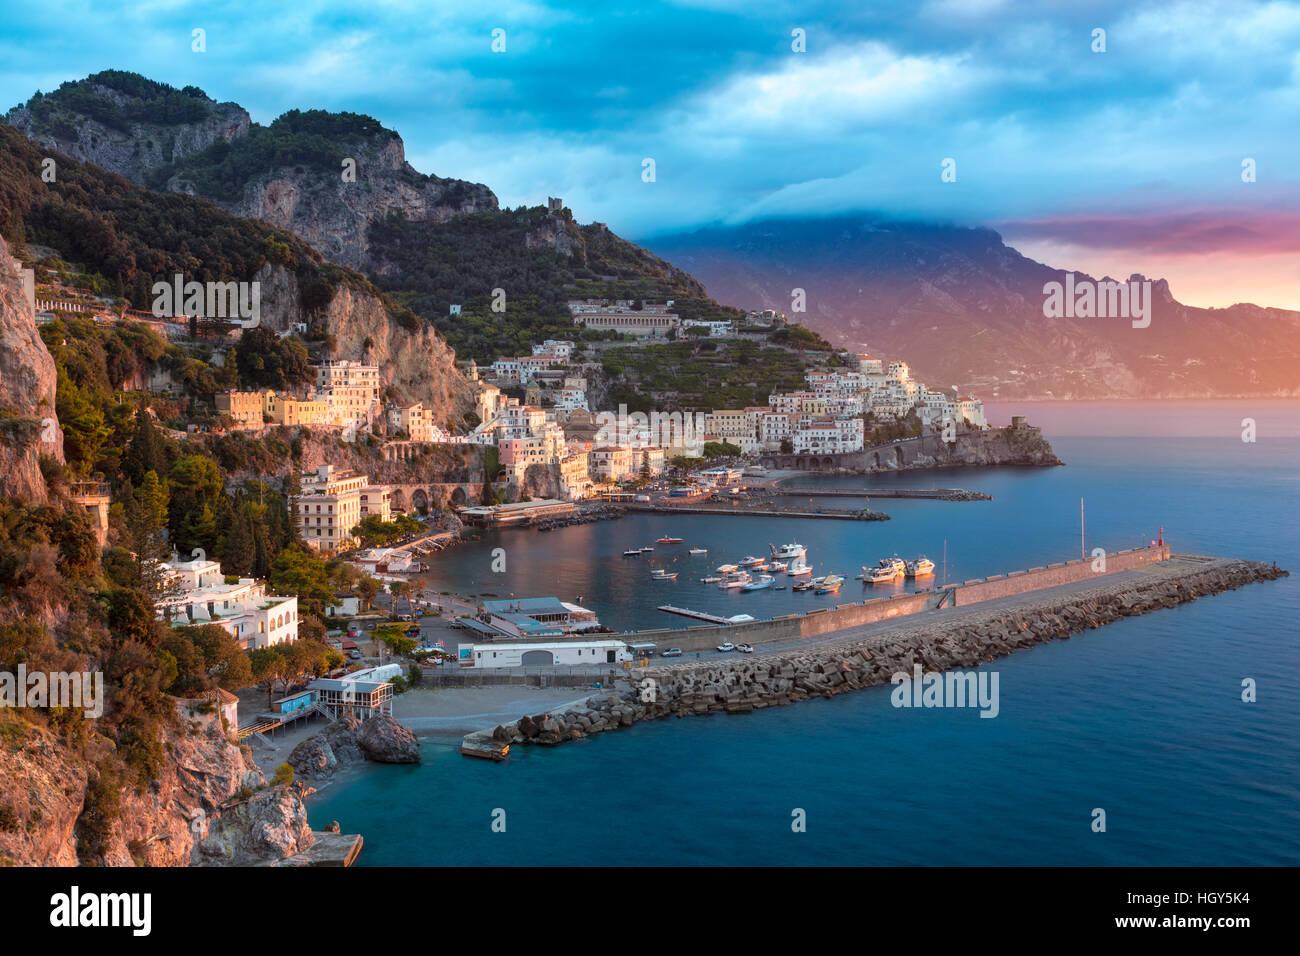 Sunrise view of Amalfi, Gulf of Salerno, Campania, Italy - Stock Image